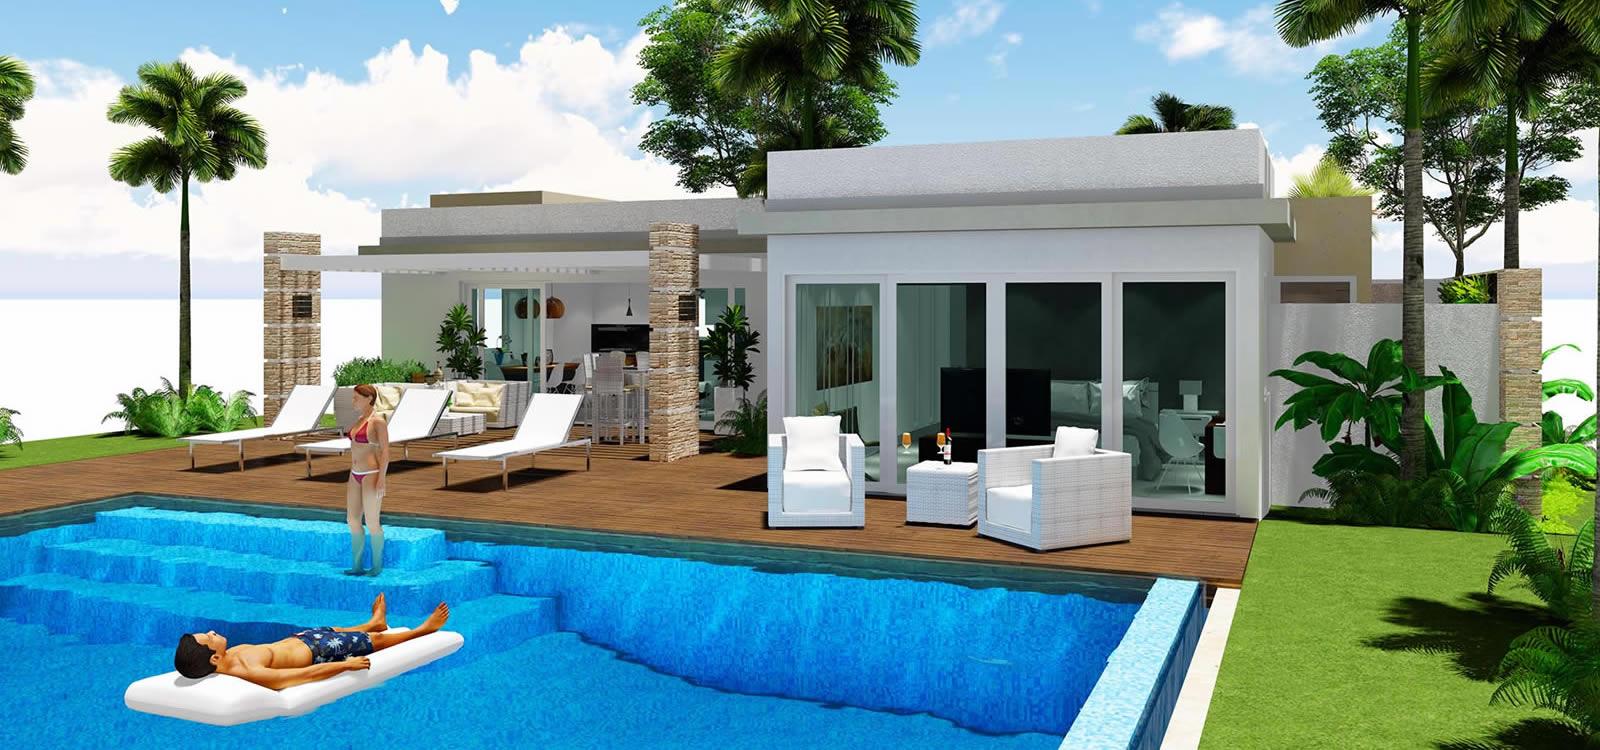 2 Bedroom Villas For In Beach Resort Bayahibe Dominican Republic 7th Heaven Properties